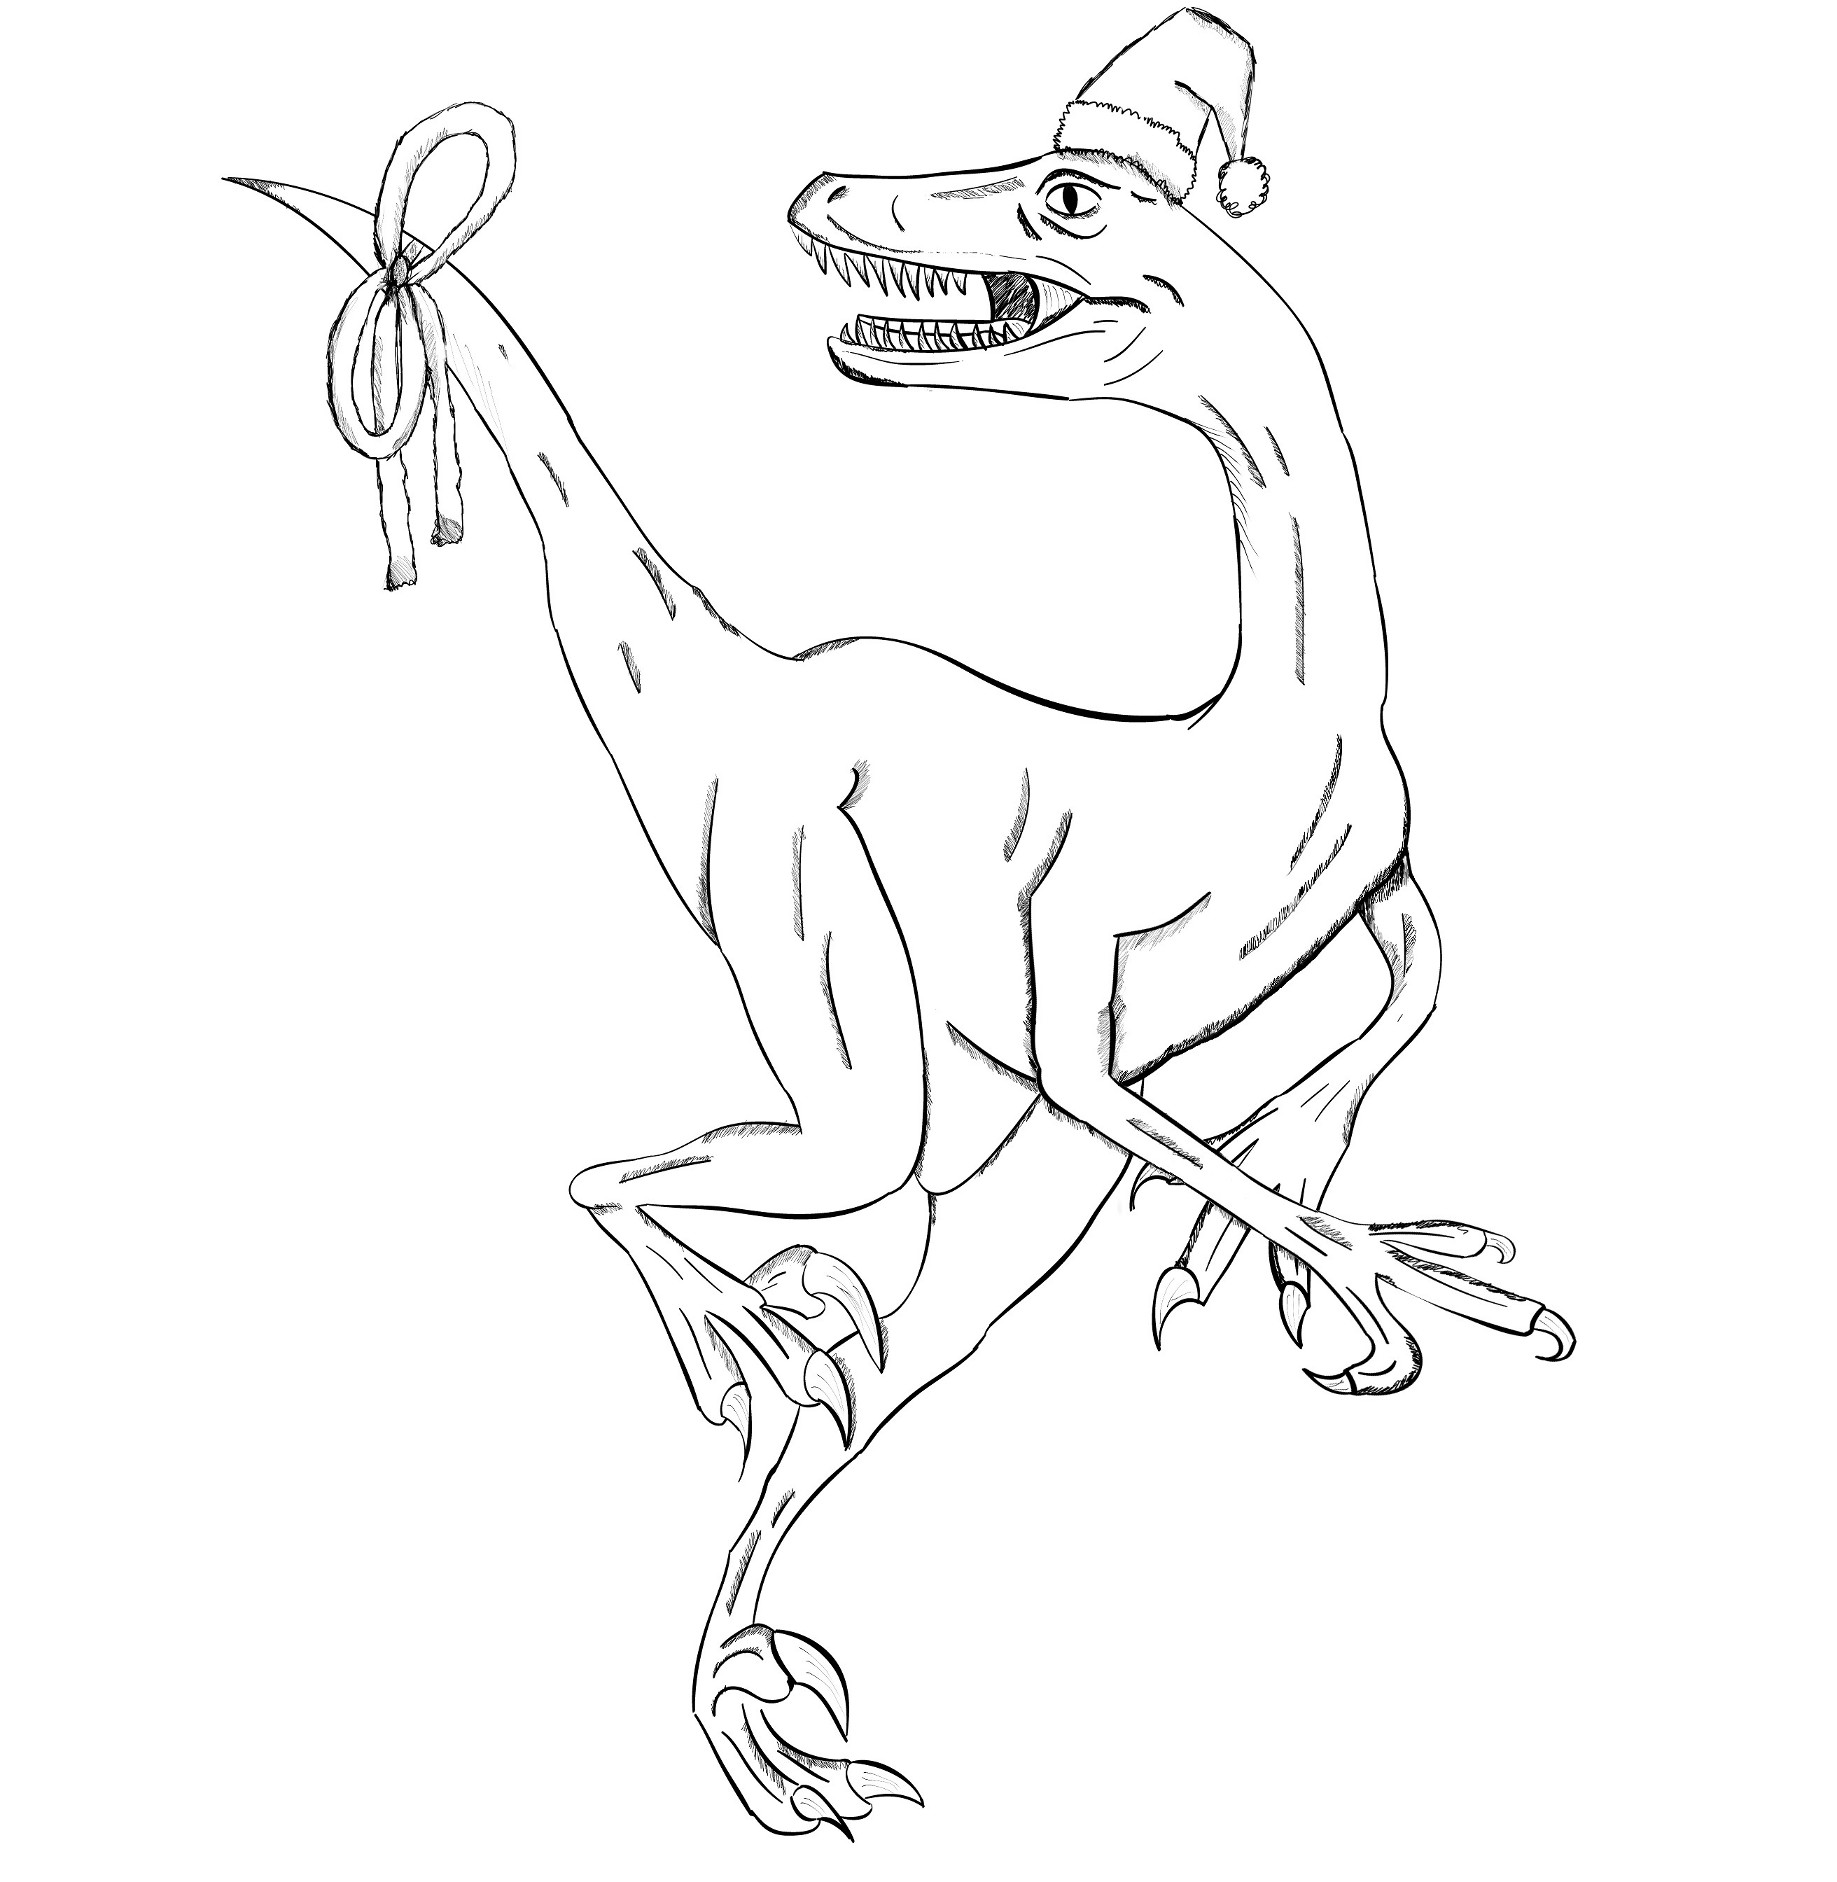 X-mas Velociraptor